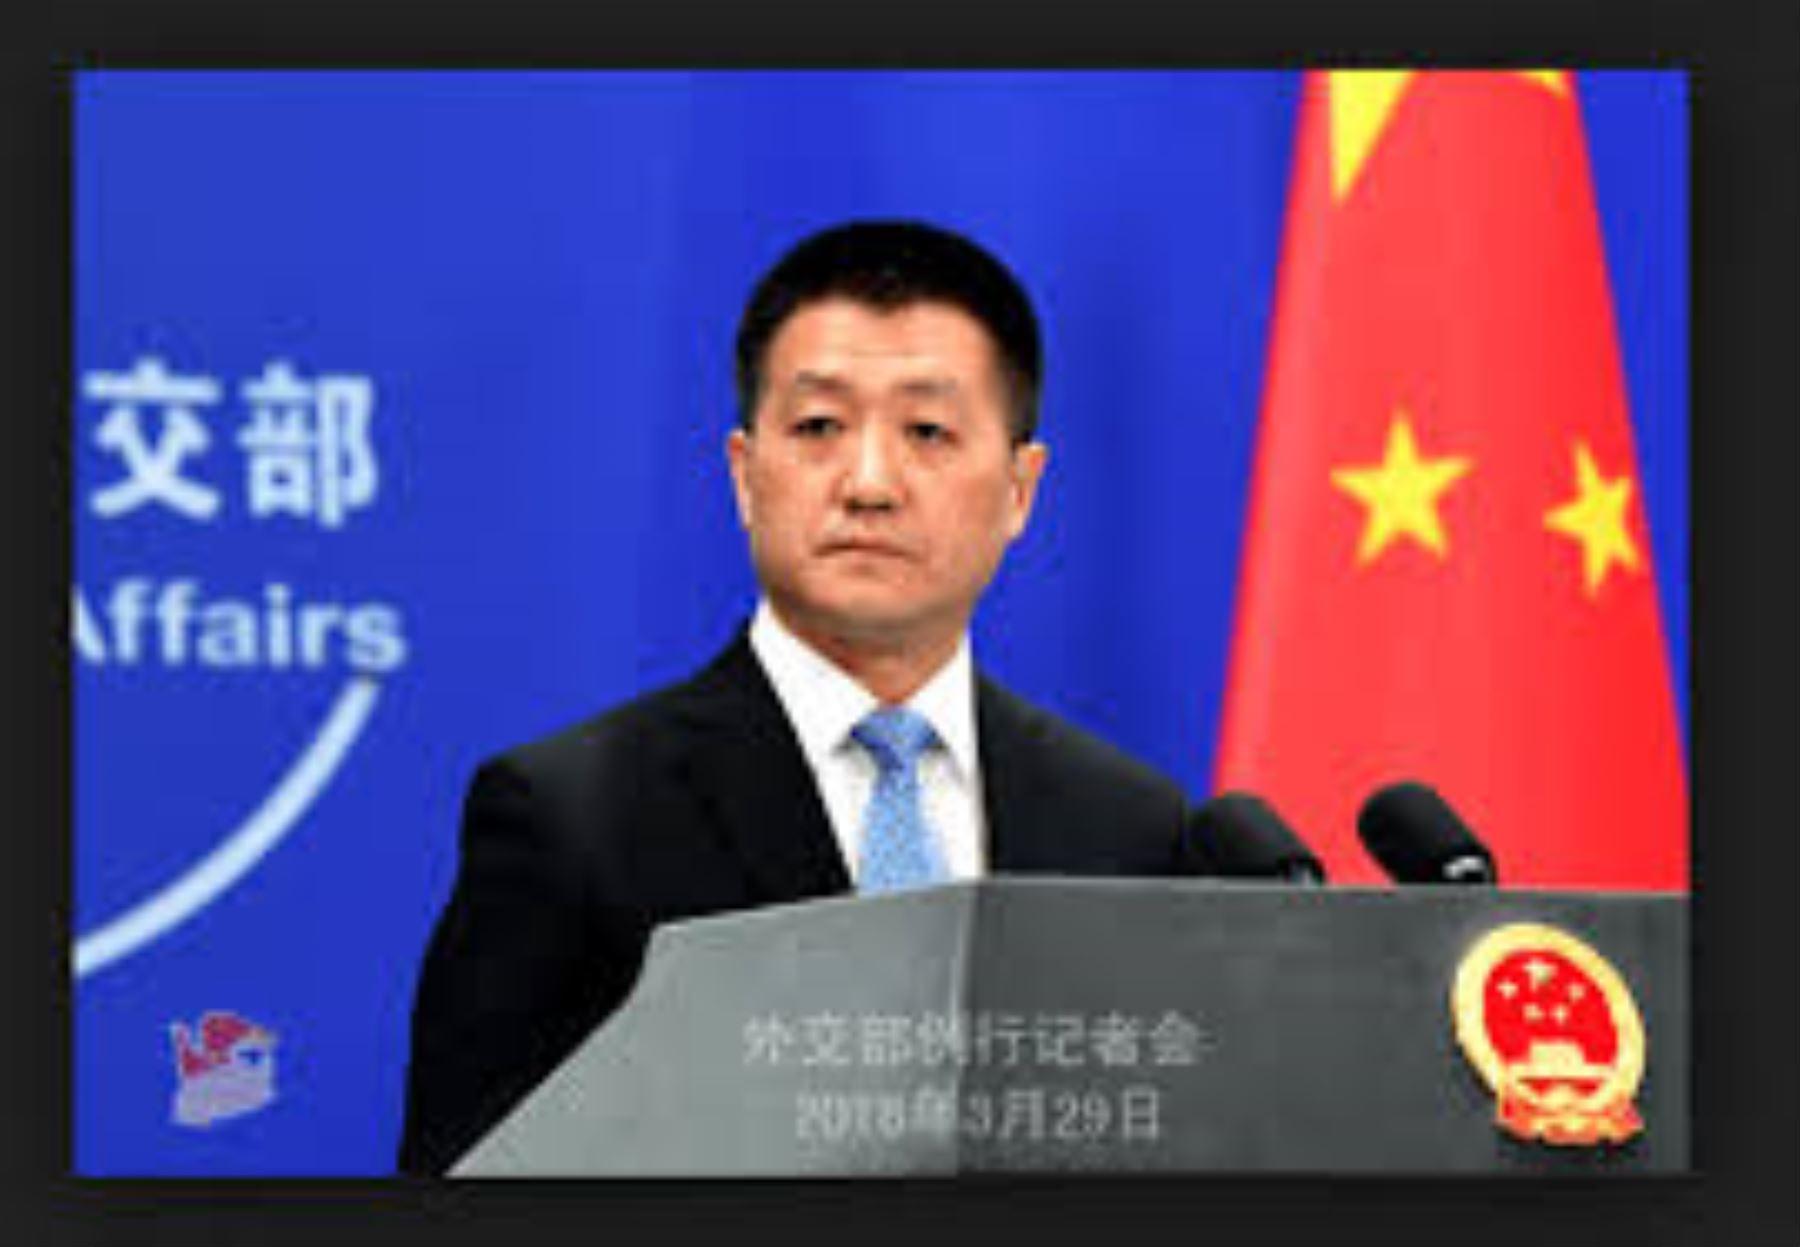 Portavoz del Ministerio de Relaciones Exteriores de China, Lu Kang.